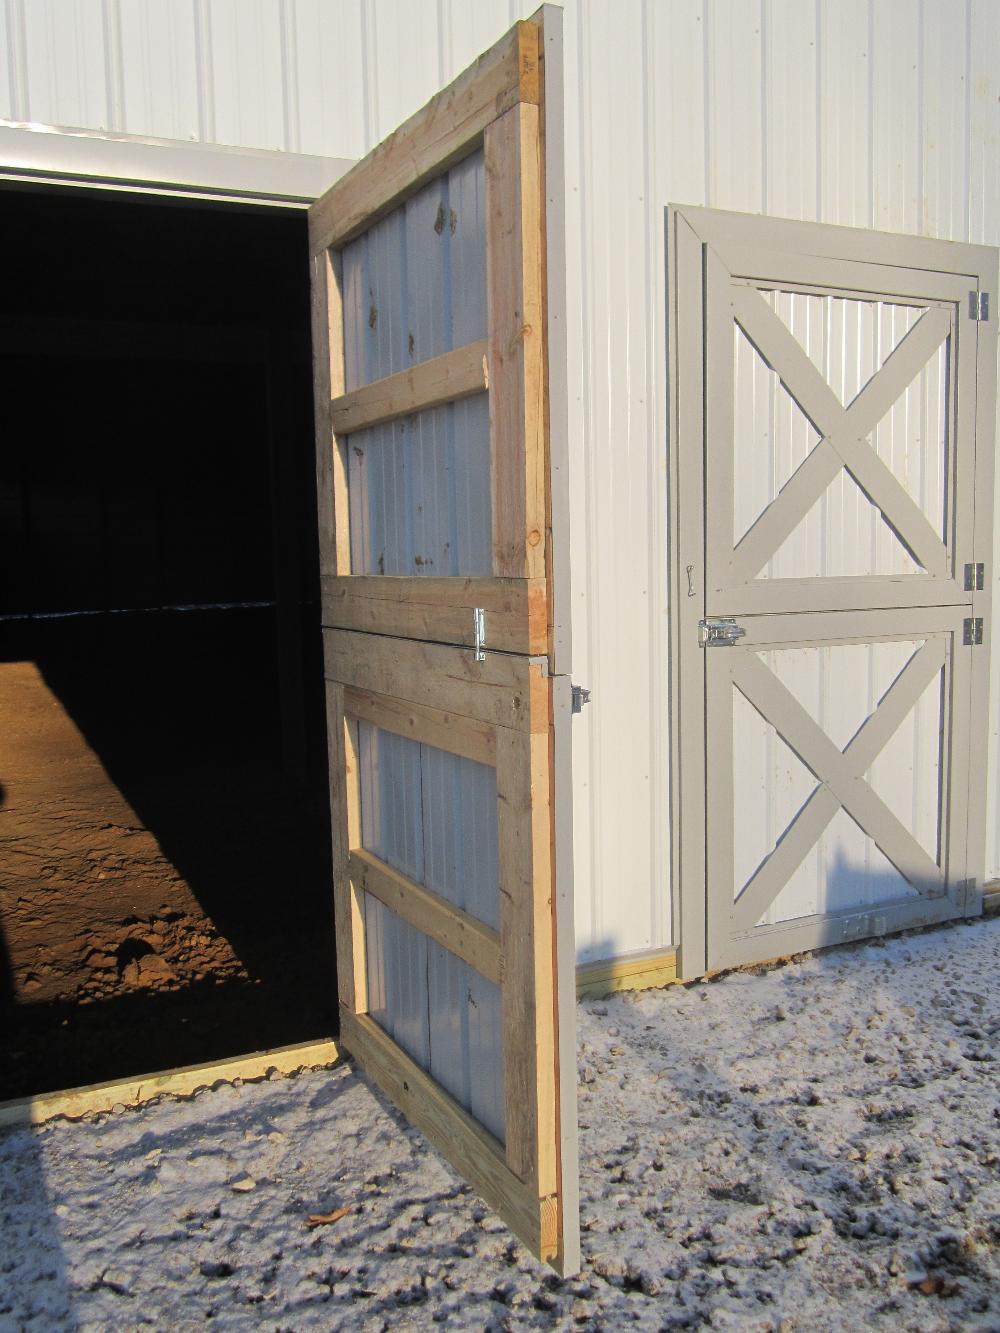 Pole Barn Kits Service Area Barns Equestrian Garage Storage Installation Learn More Options Colors Doo In 2020 Exterior Barn Doors Horse Barn Doors Barn Door Designs